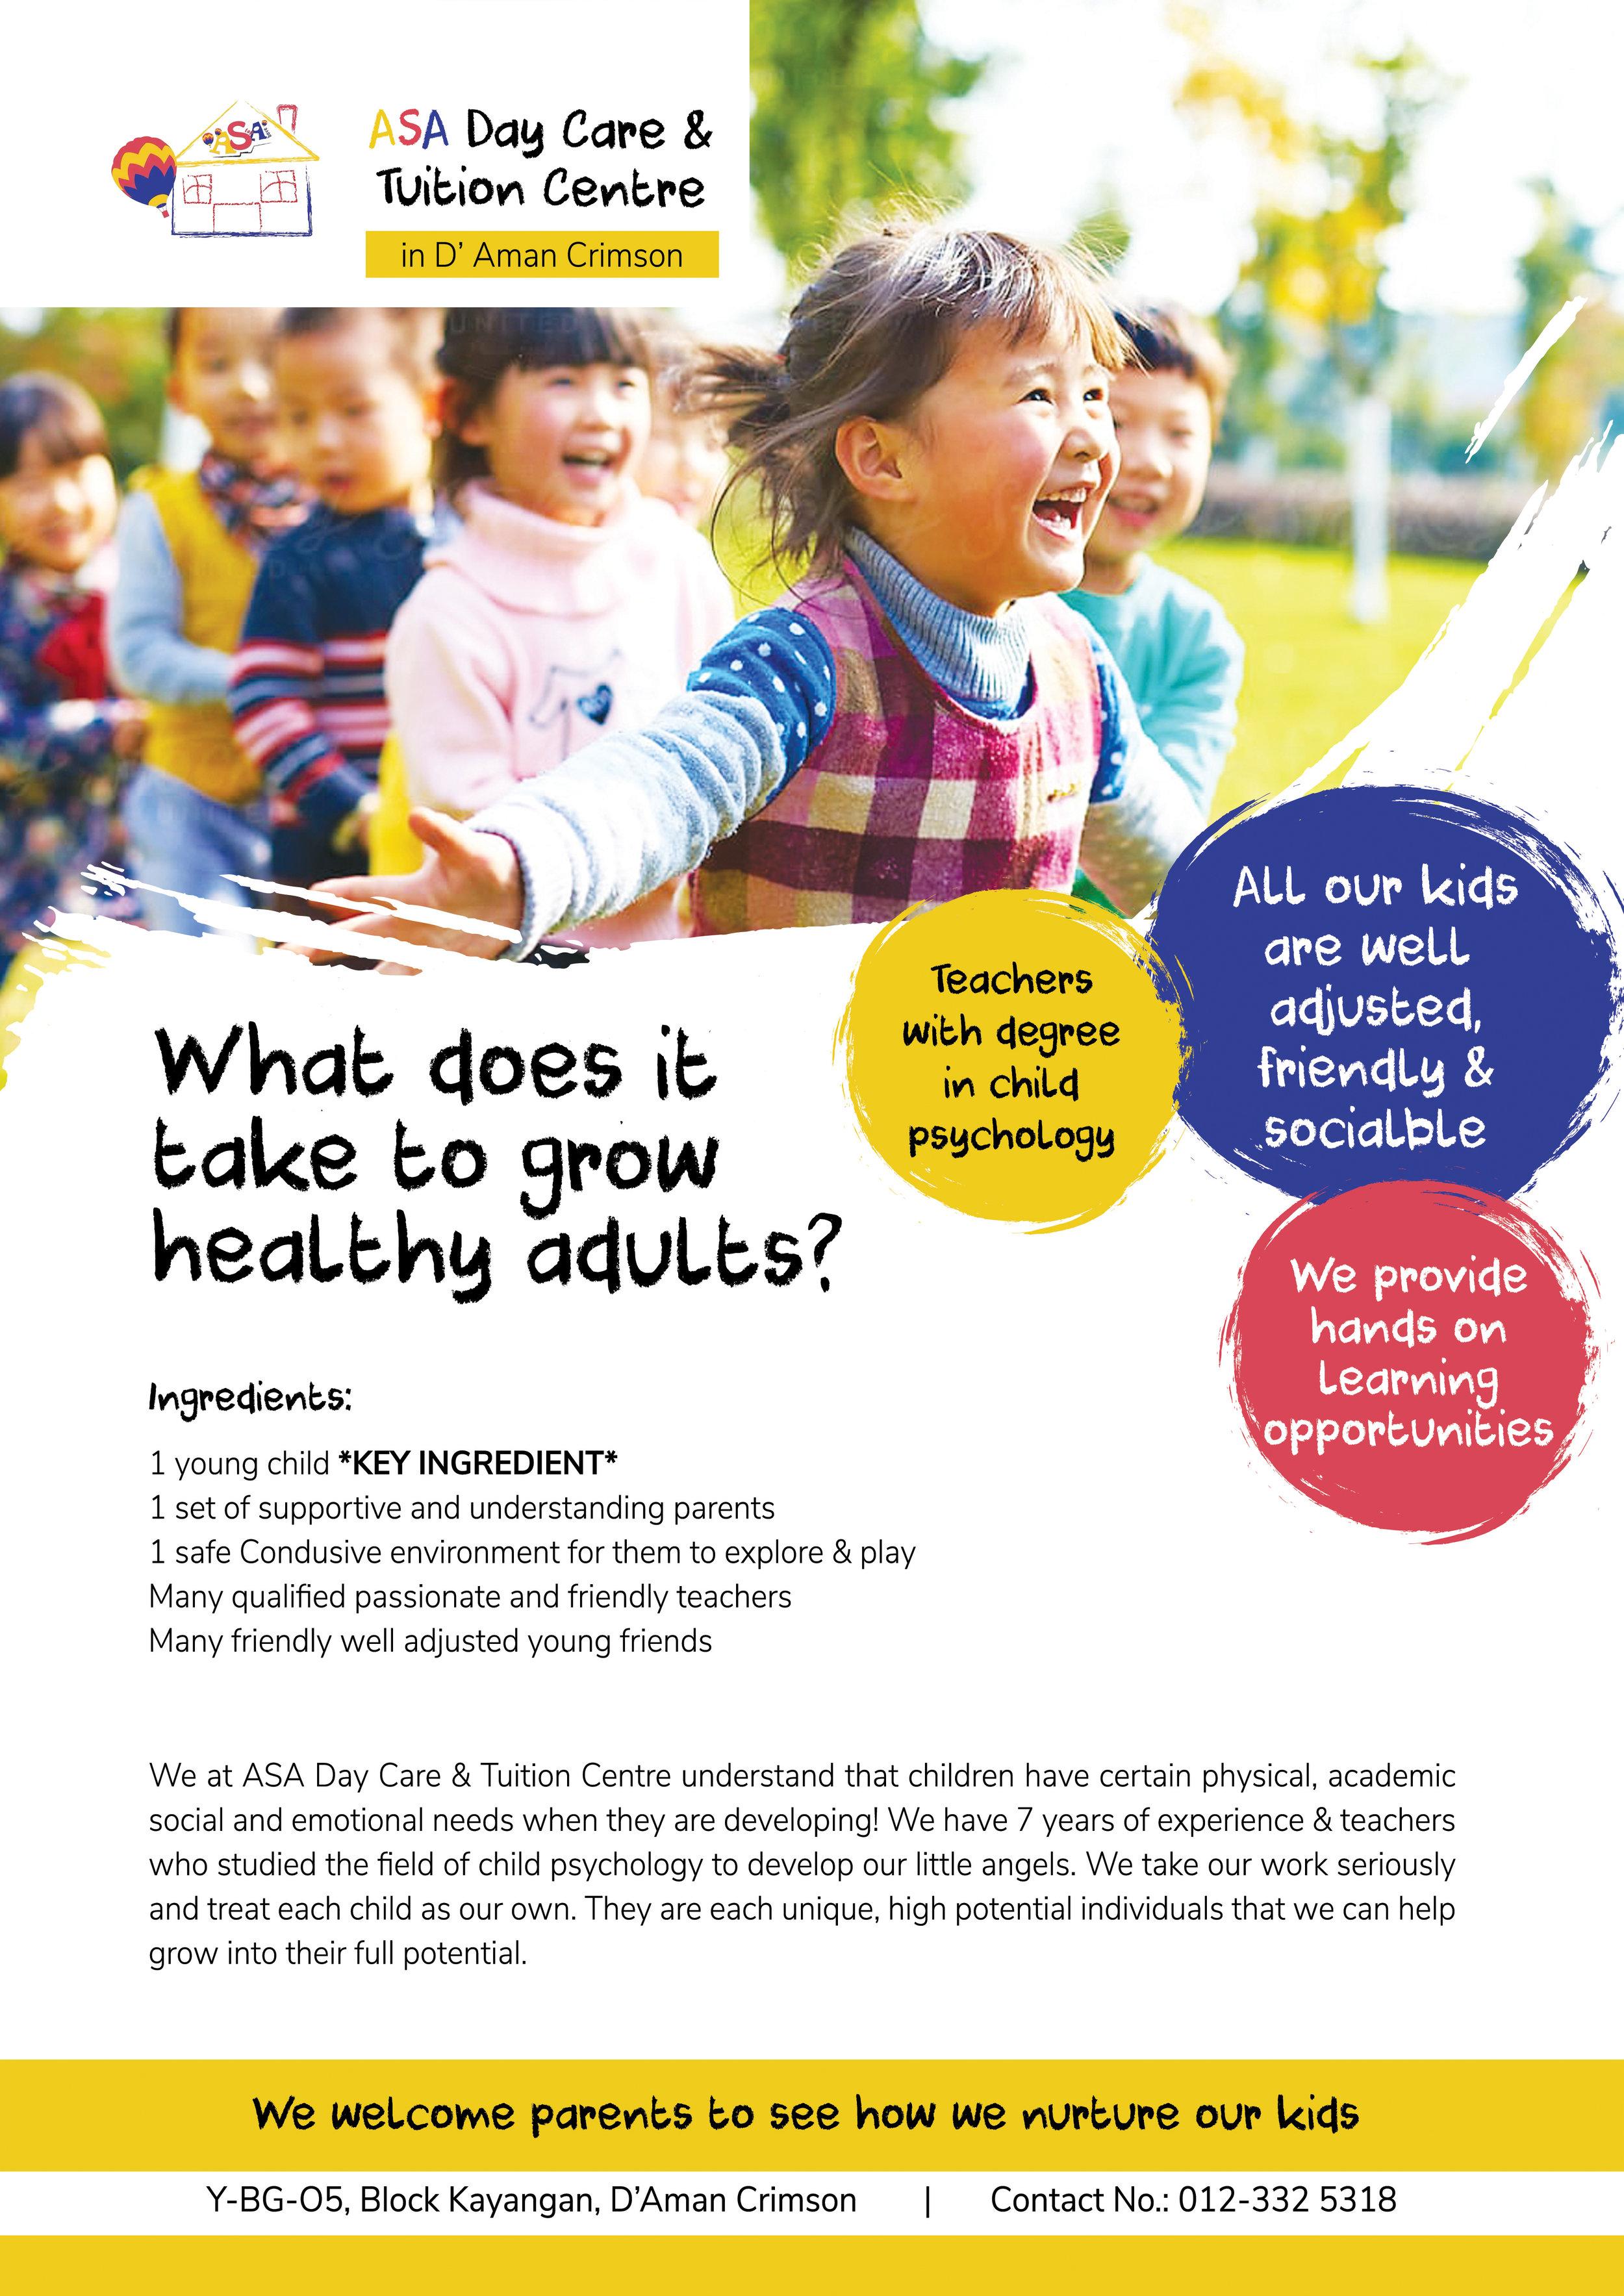 01 ASA Day Care - introduction.jpg